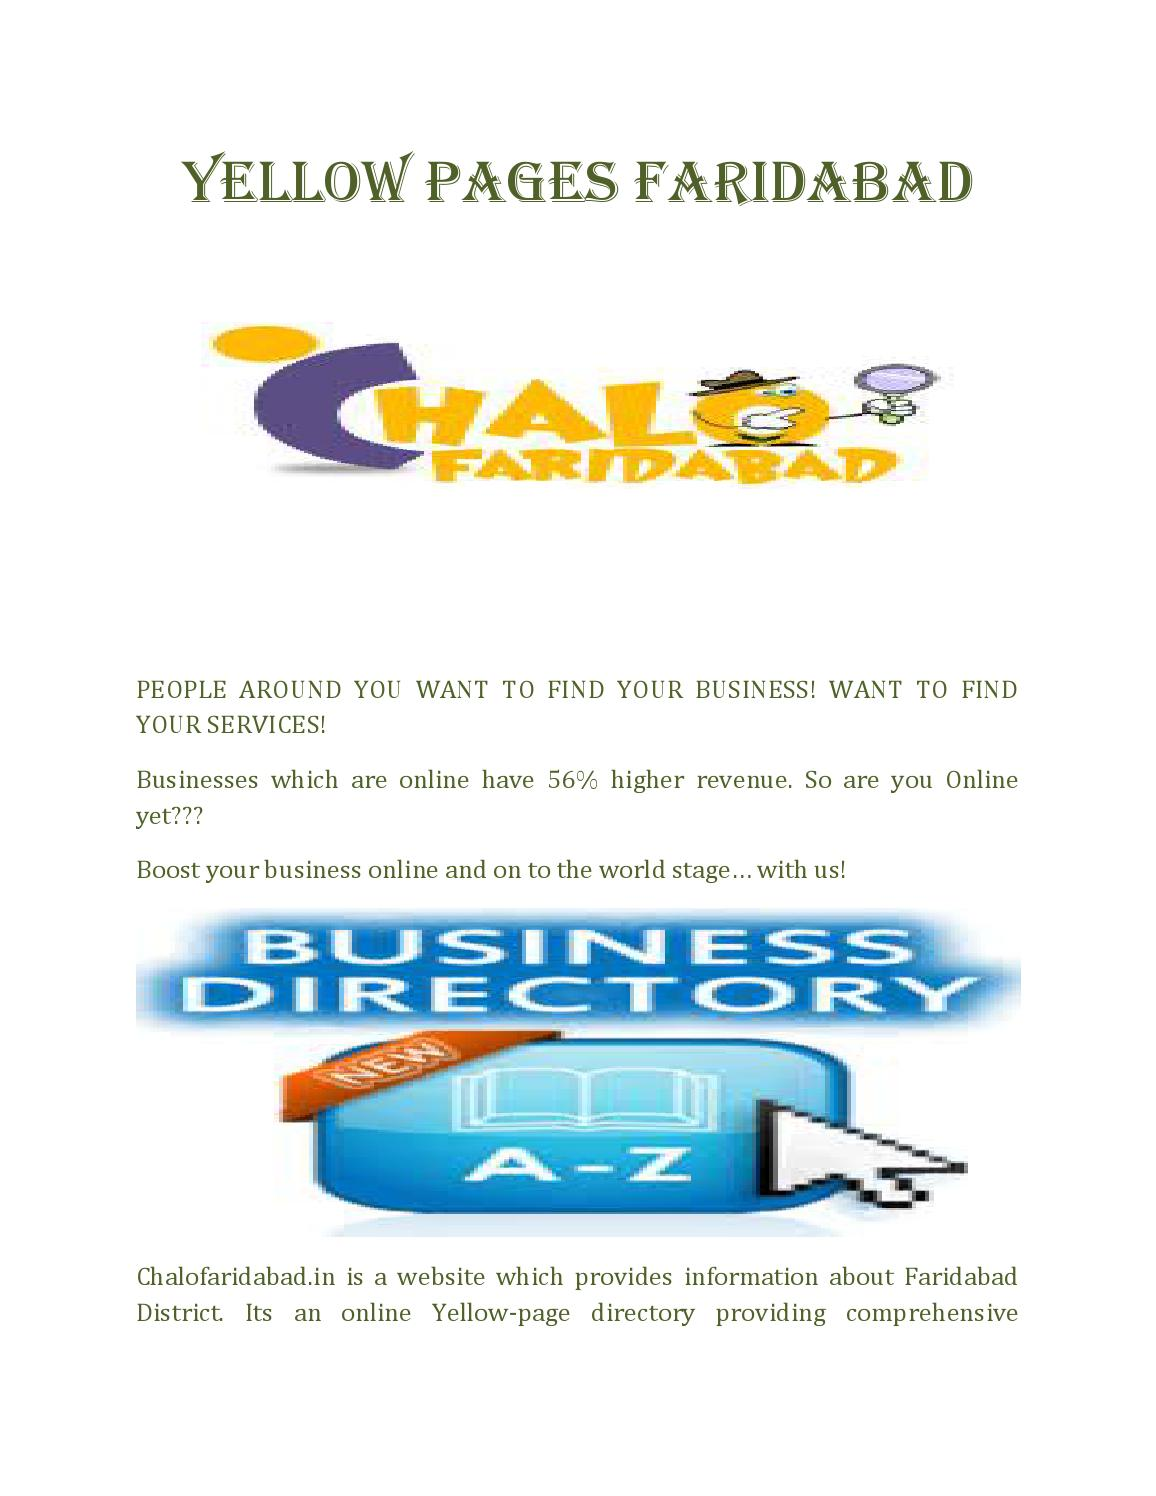 Chalo faridabad directory by umeshwebseeker - issuu